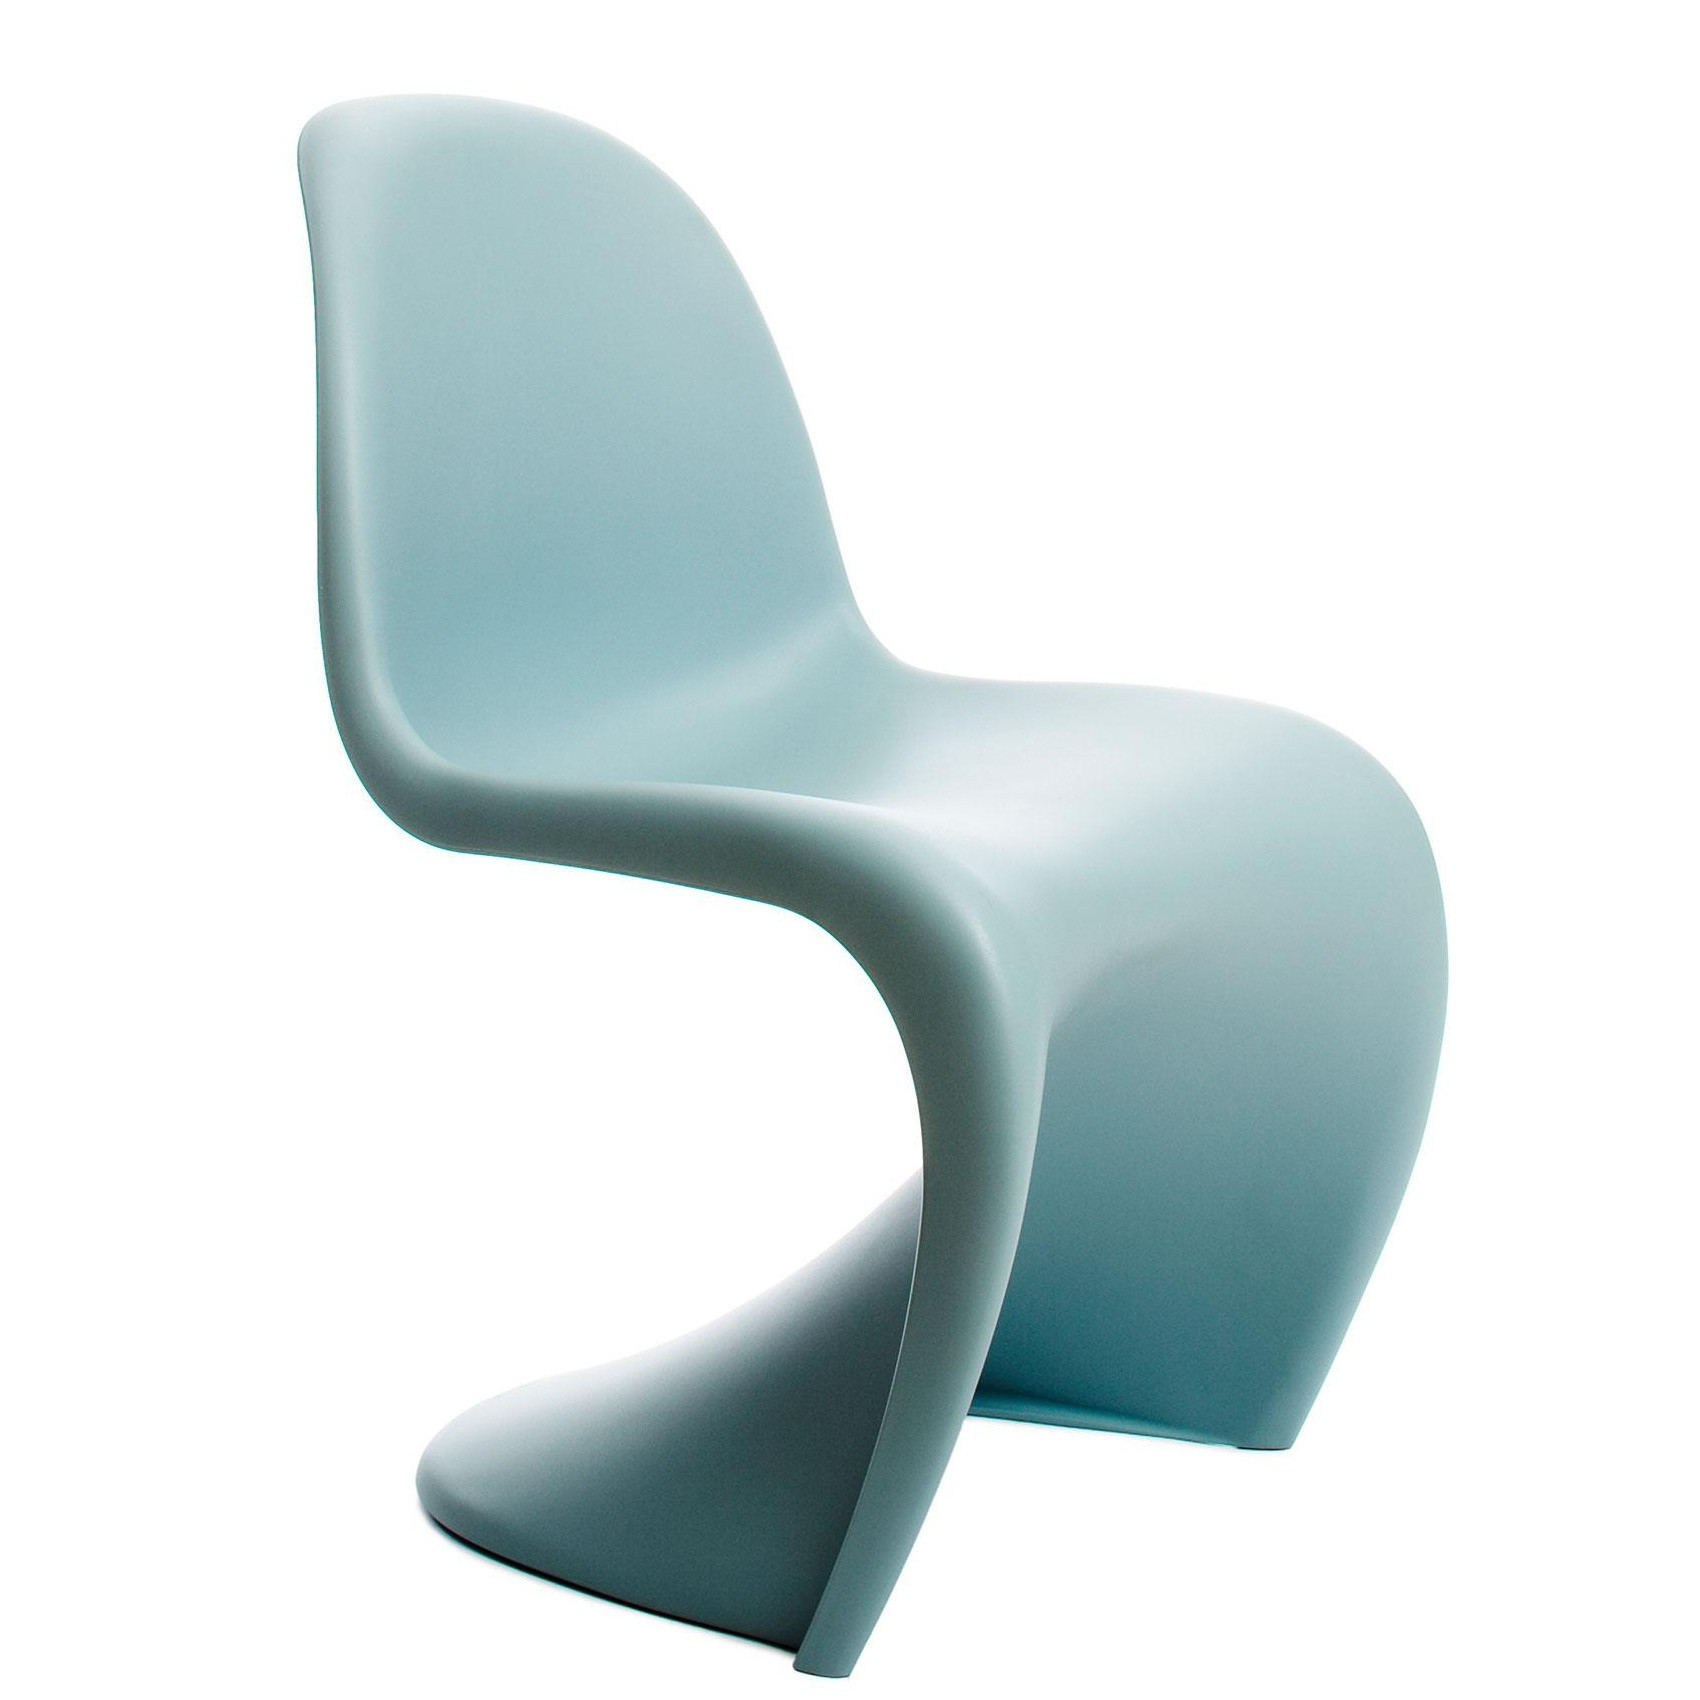 Vitra_Panton-Chair_1700x1700-ID1924498-ad46c3d2e635e5a99acd3a37d546e807.jpg